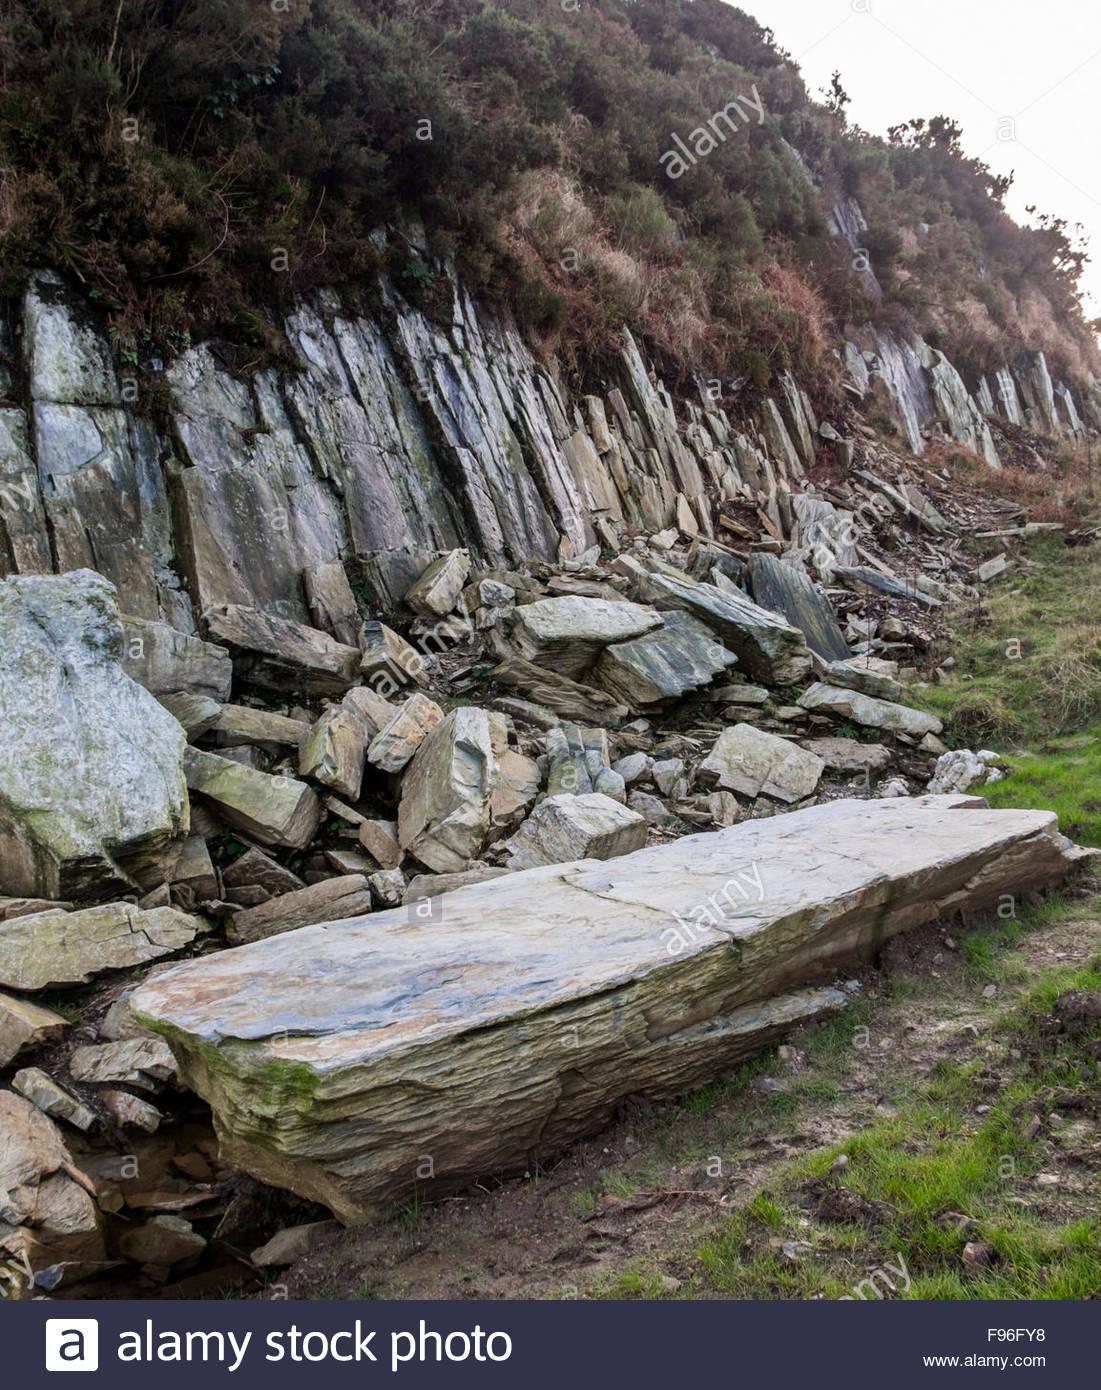 A rocky outcrop at Craig Rhos-y-felin, near Crosswell, north Pembrokeshire. - Stock Image